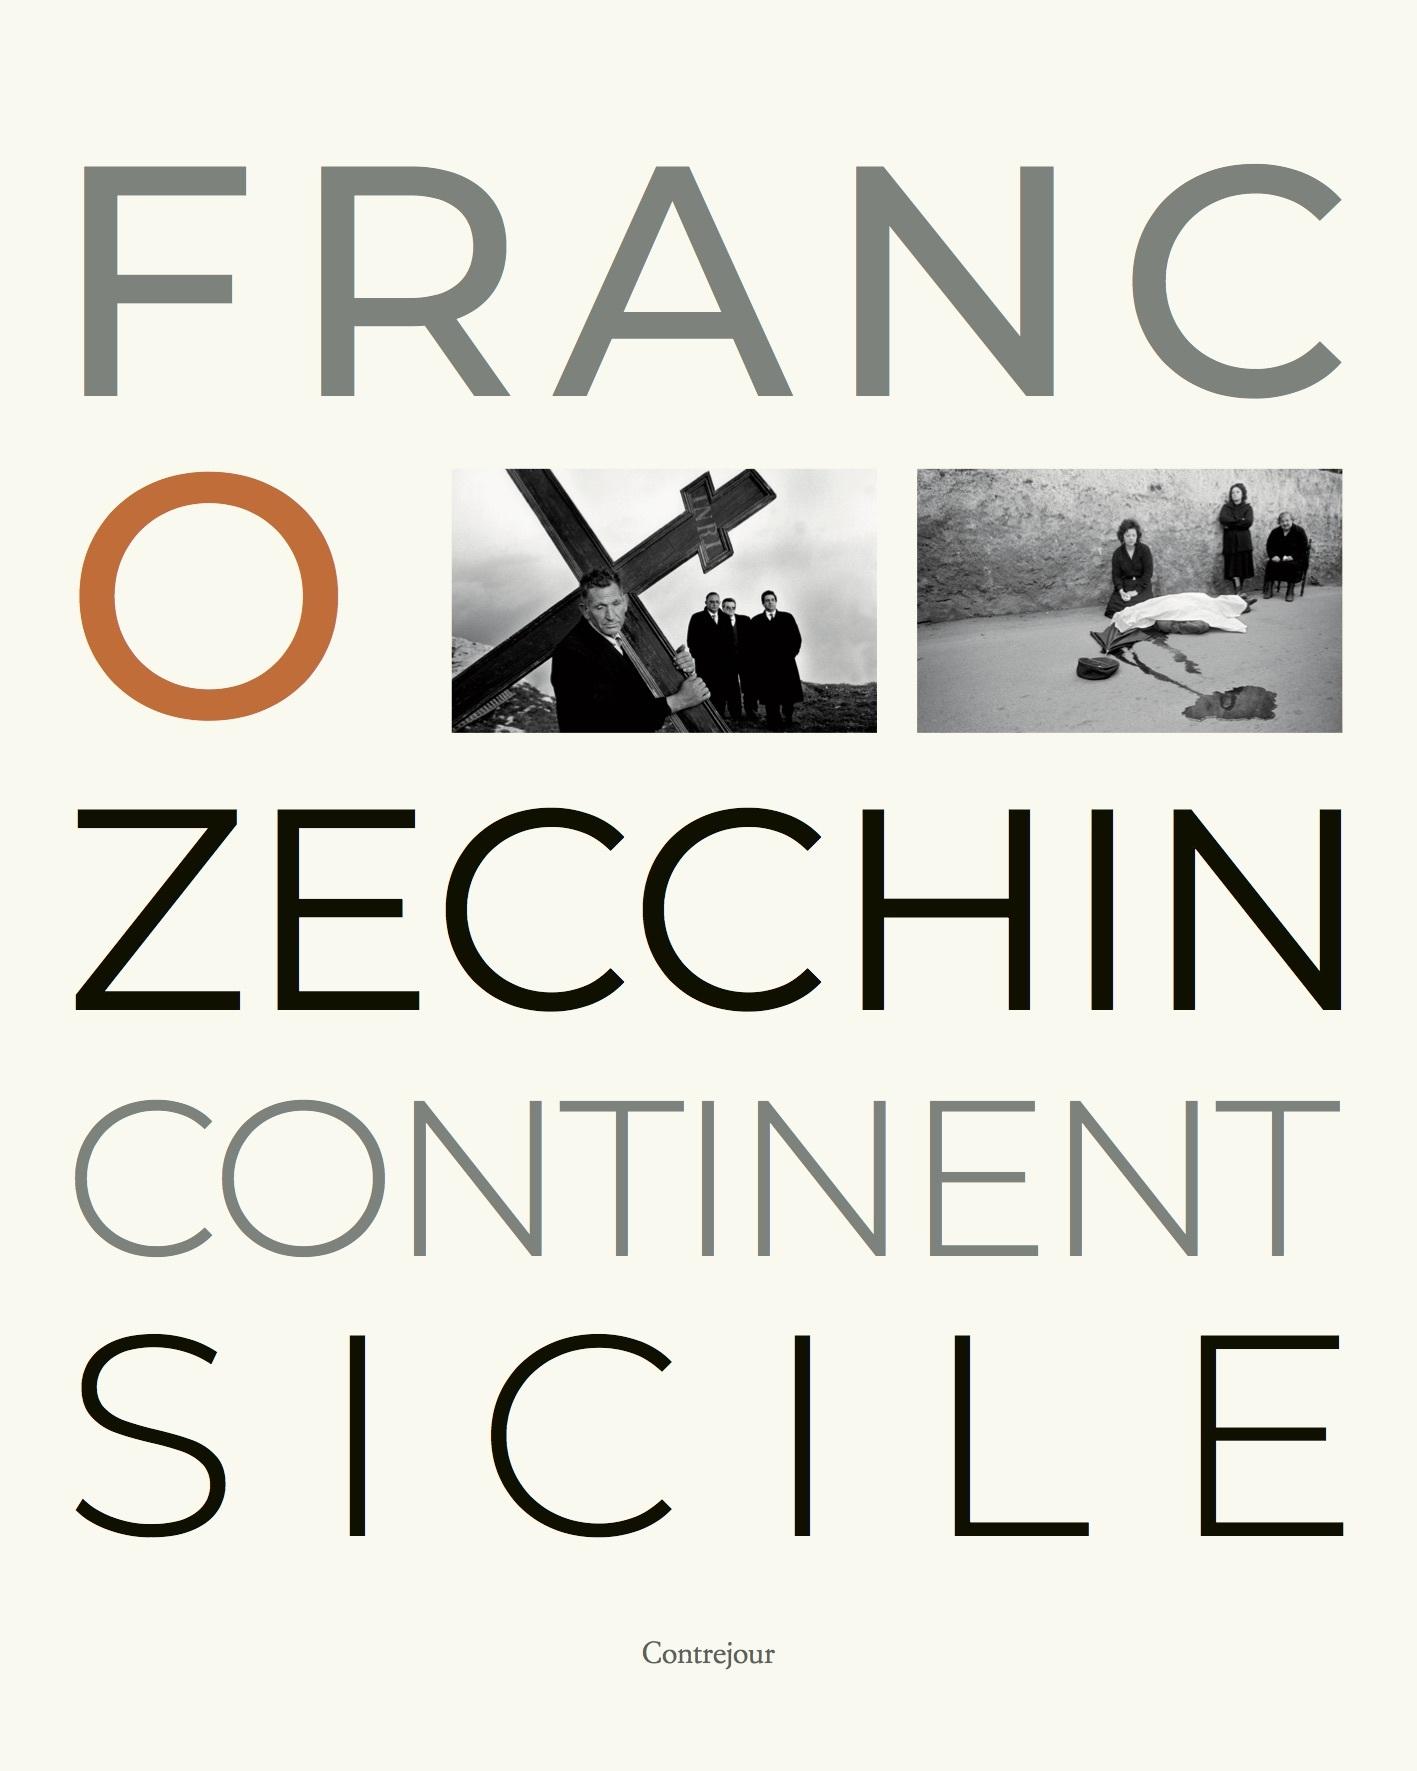 FRANCO ZECCHIN, CONTINENT SICILE